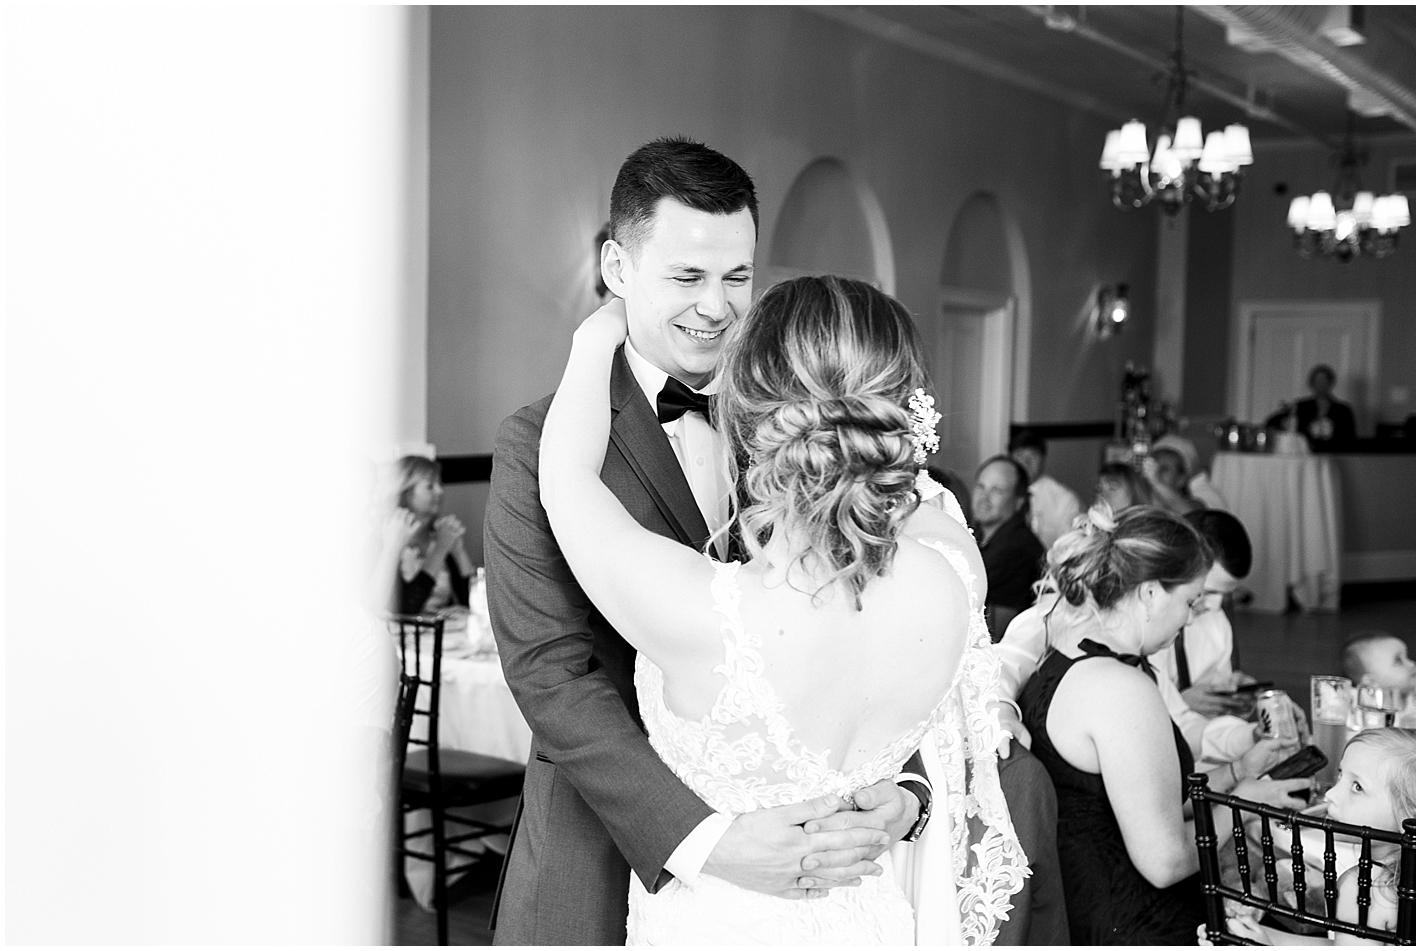 Vics by the River Savannah GA Wedding Reception Photos by Alyssa Parker Photography